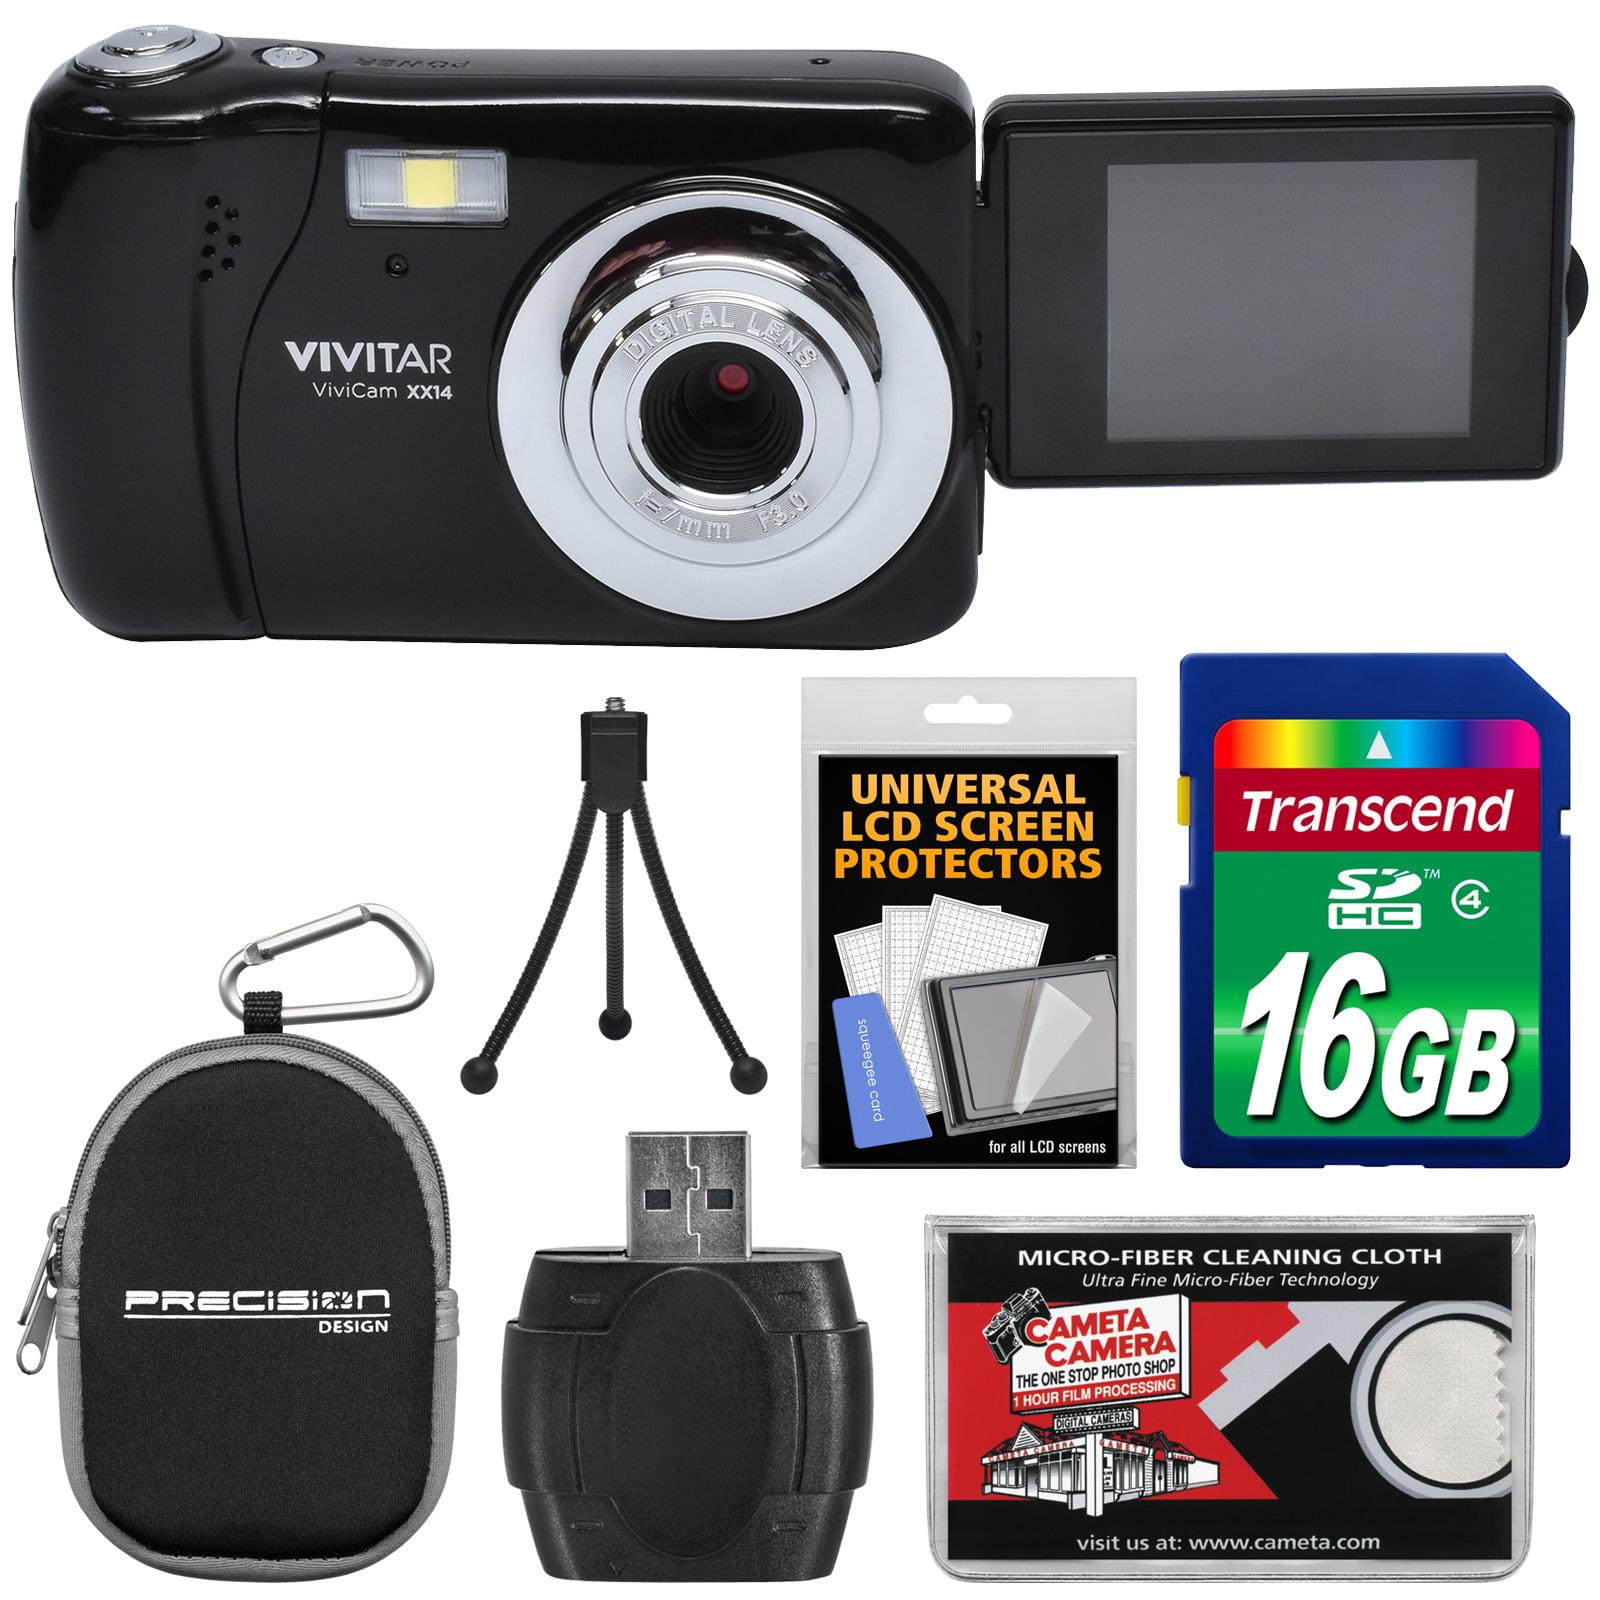 Vivitar ViviCam VXX14 Selfie Digital Camera (Black) with 16GB Card + Case + Tripod + Reader + Kit by Vivitar